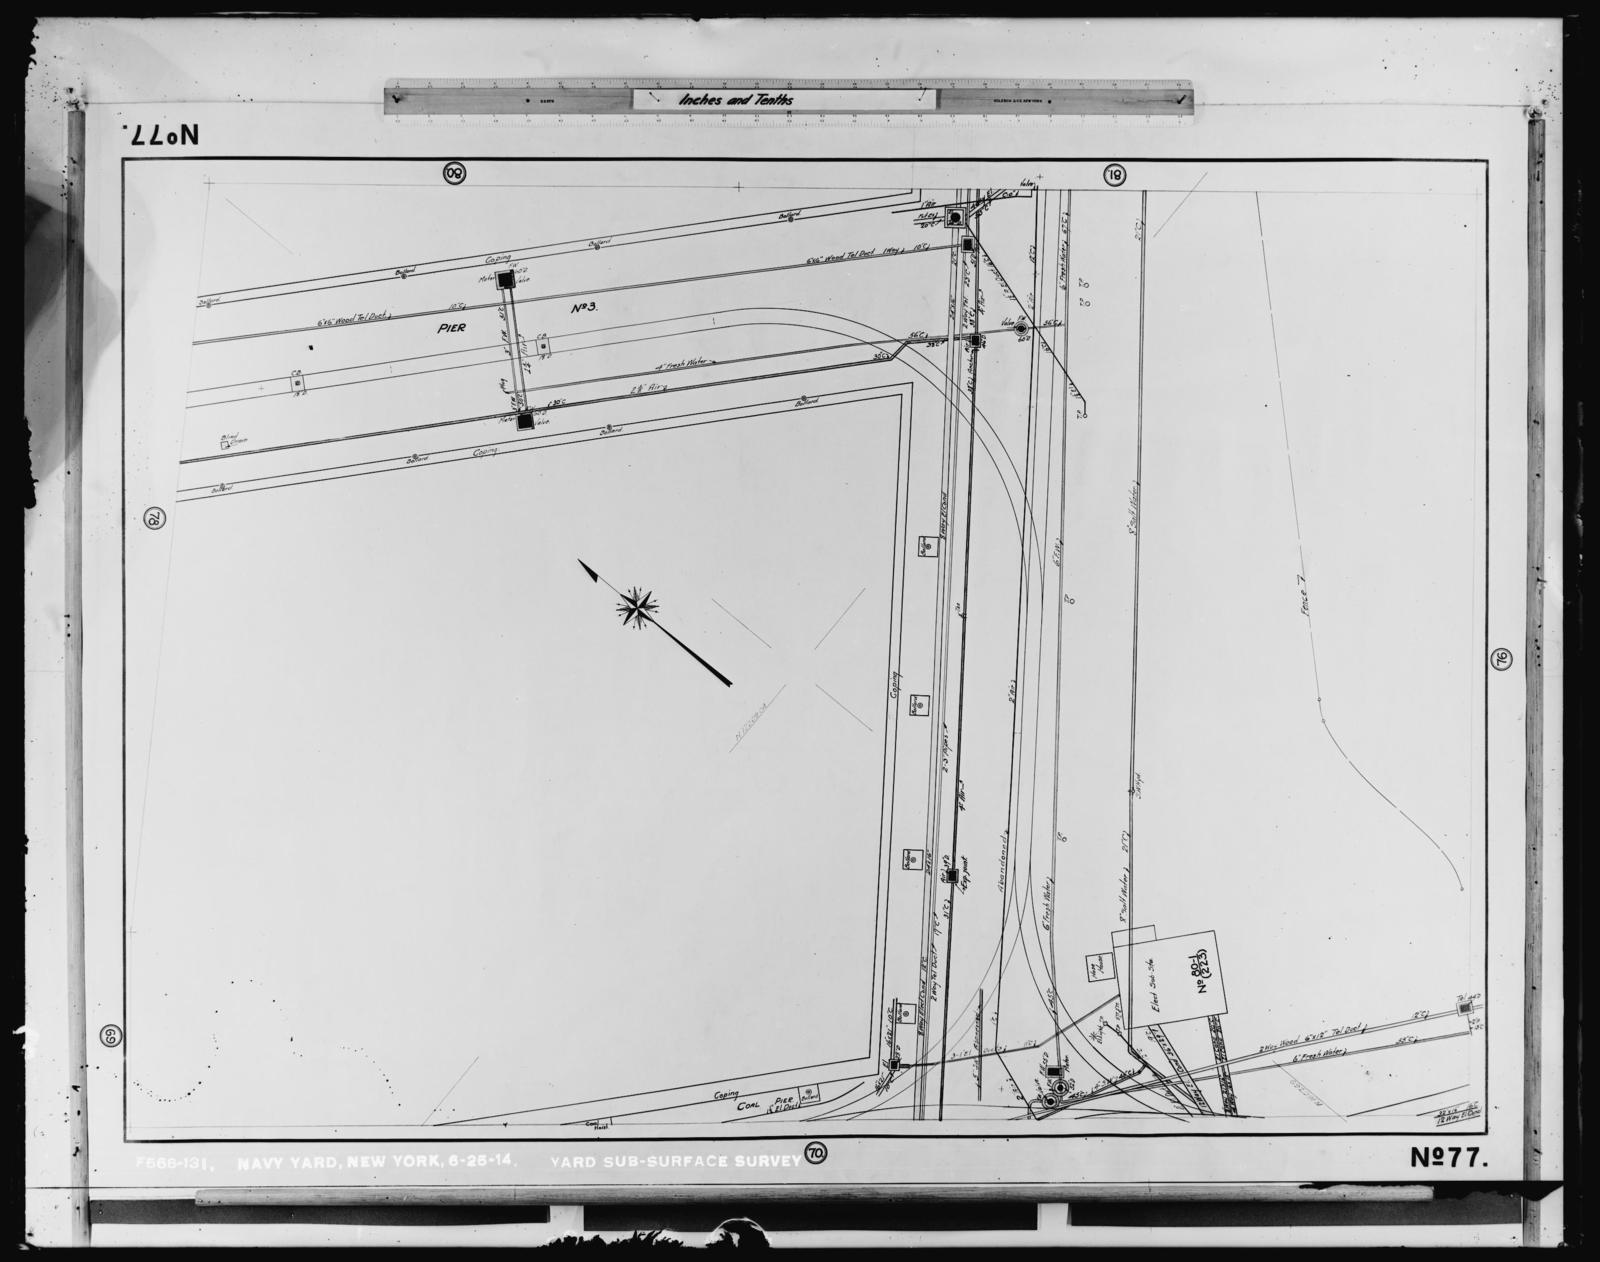 Yard Sub-Surface Survey (No. 77)